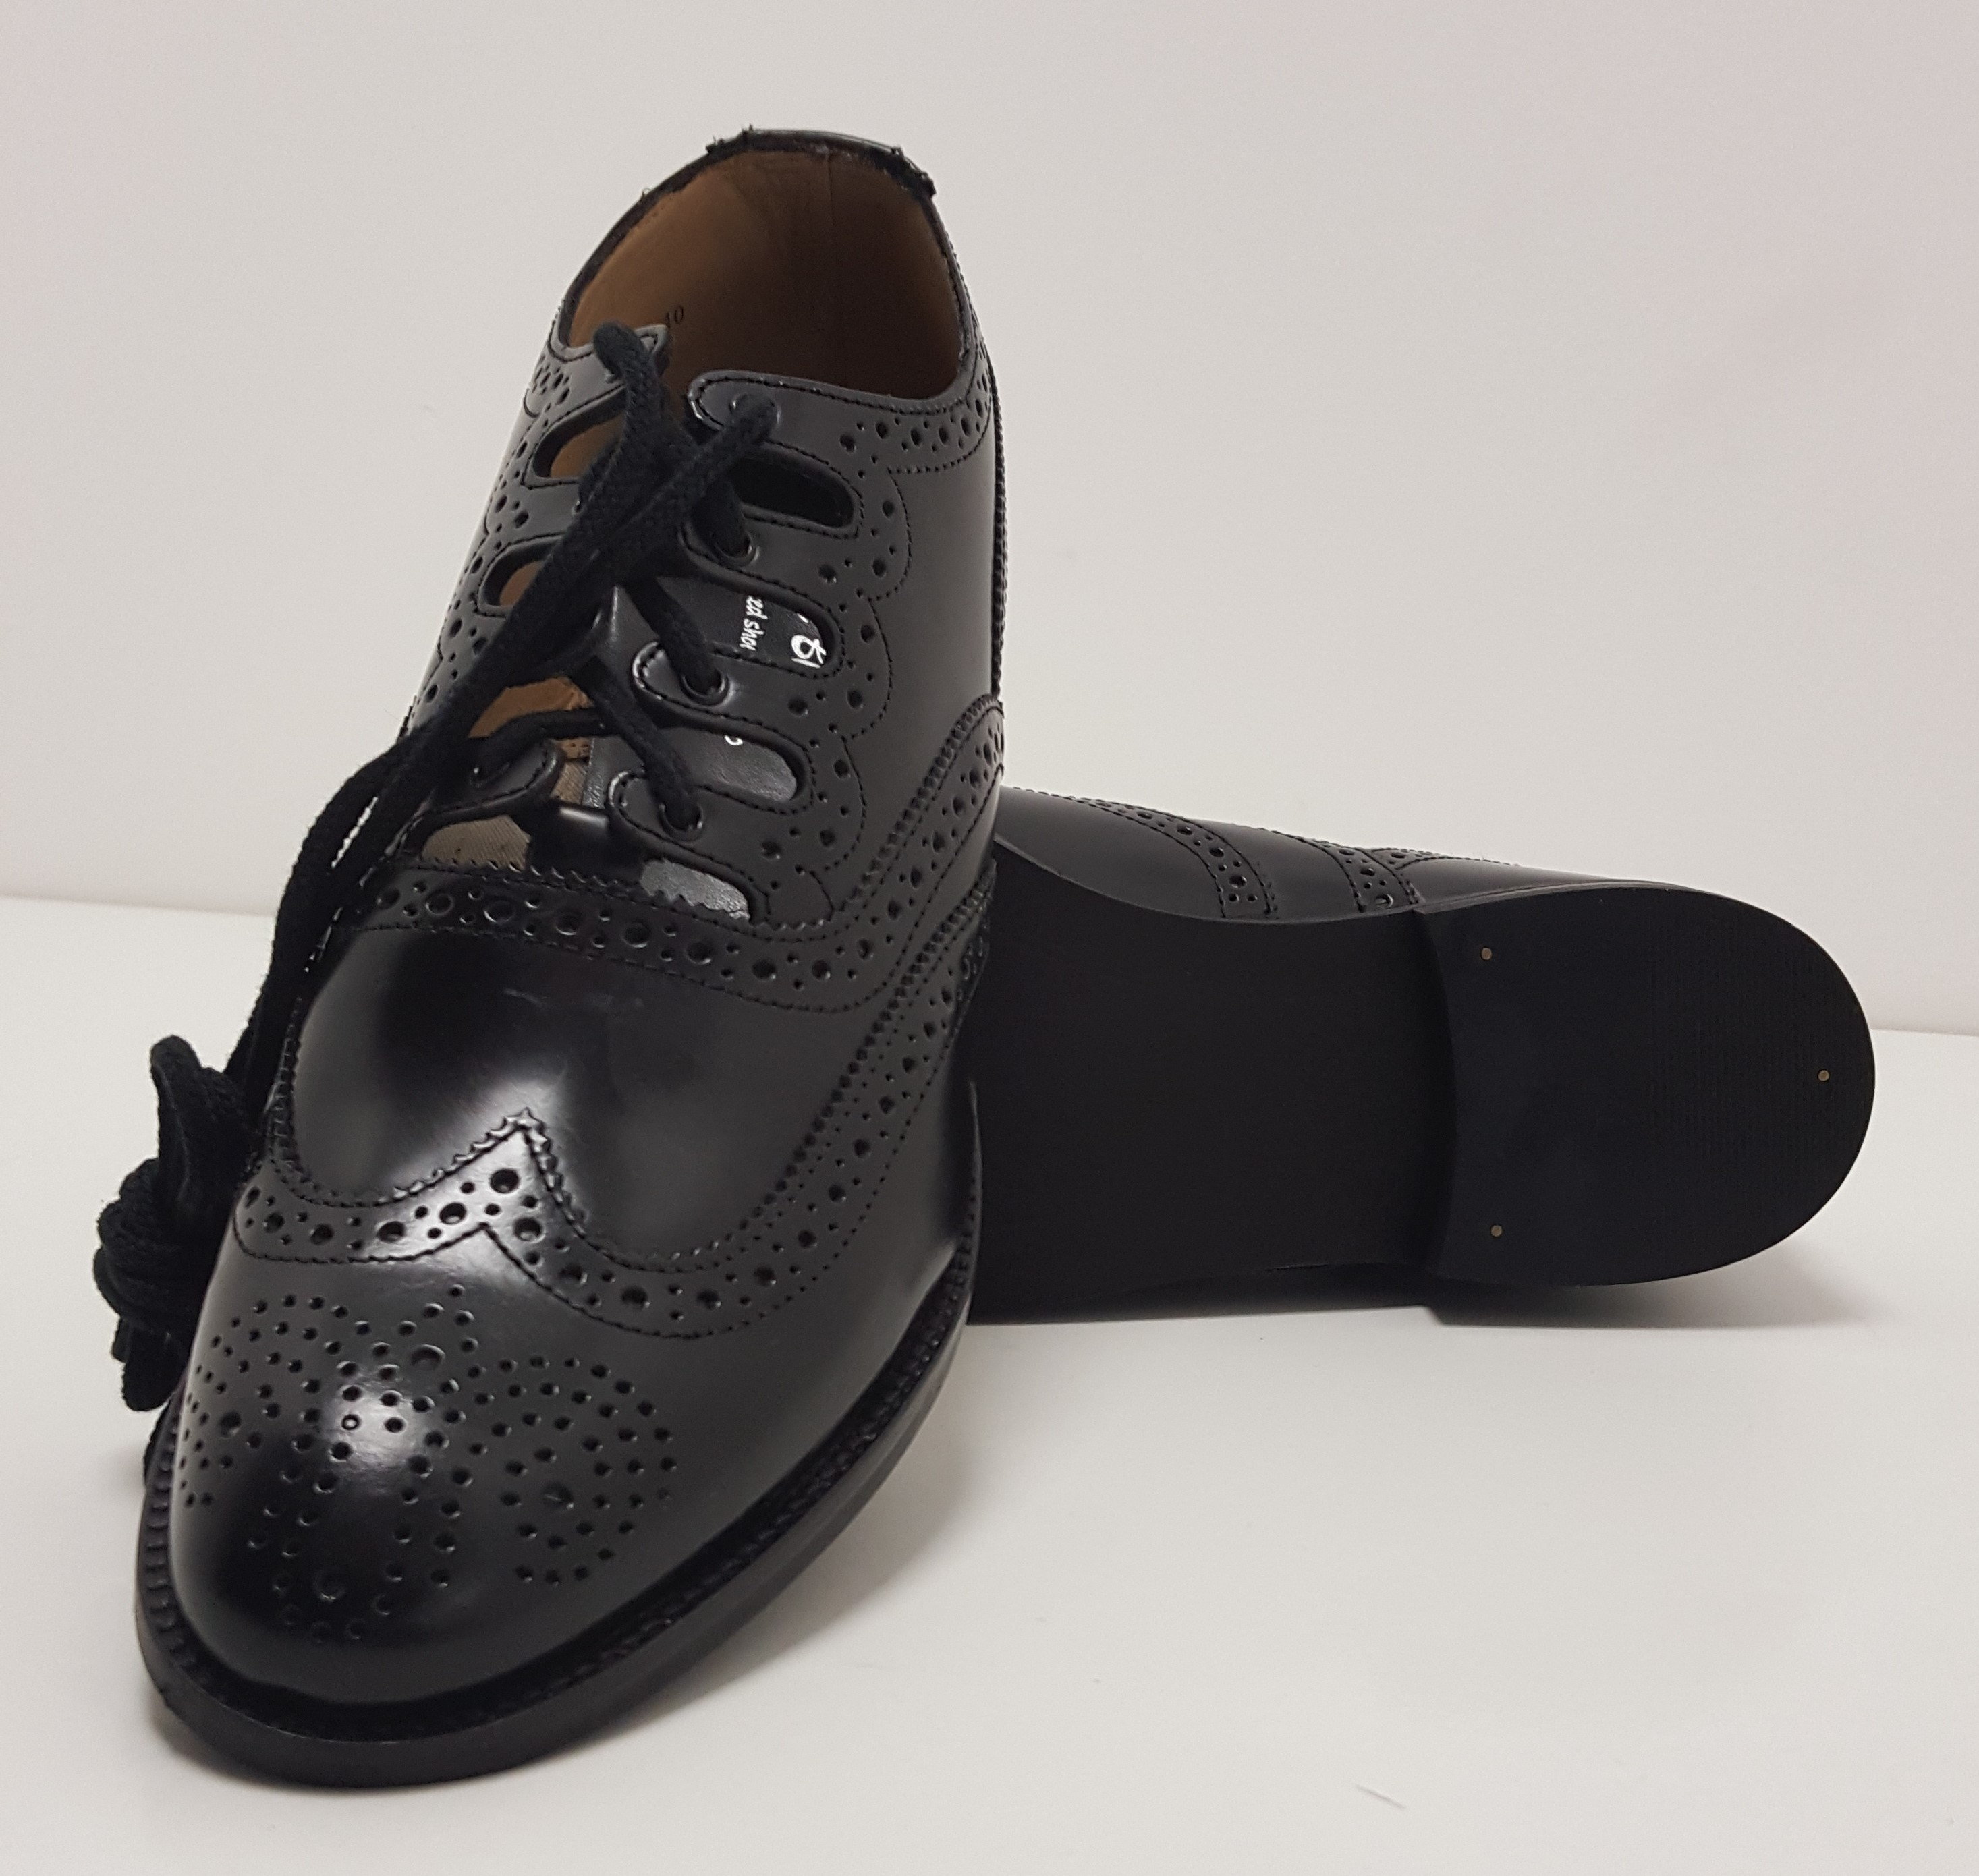 Billabong Grove Brown Leather Zip Wallet RRP $49.99 NWOT.